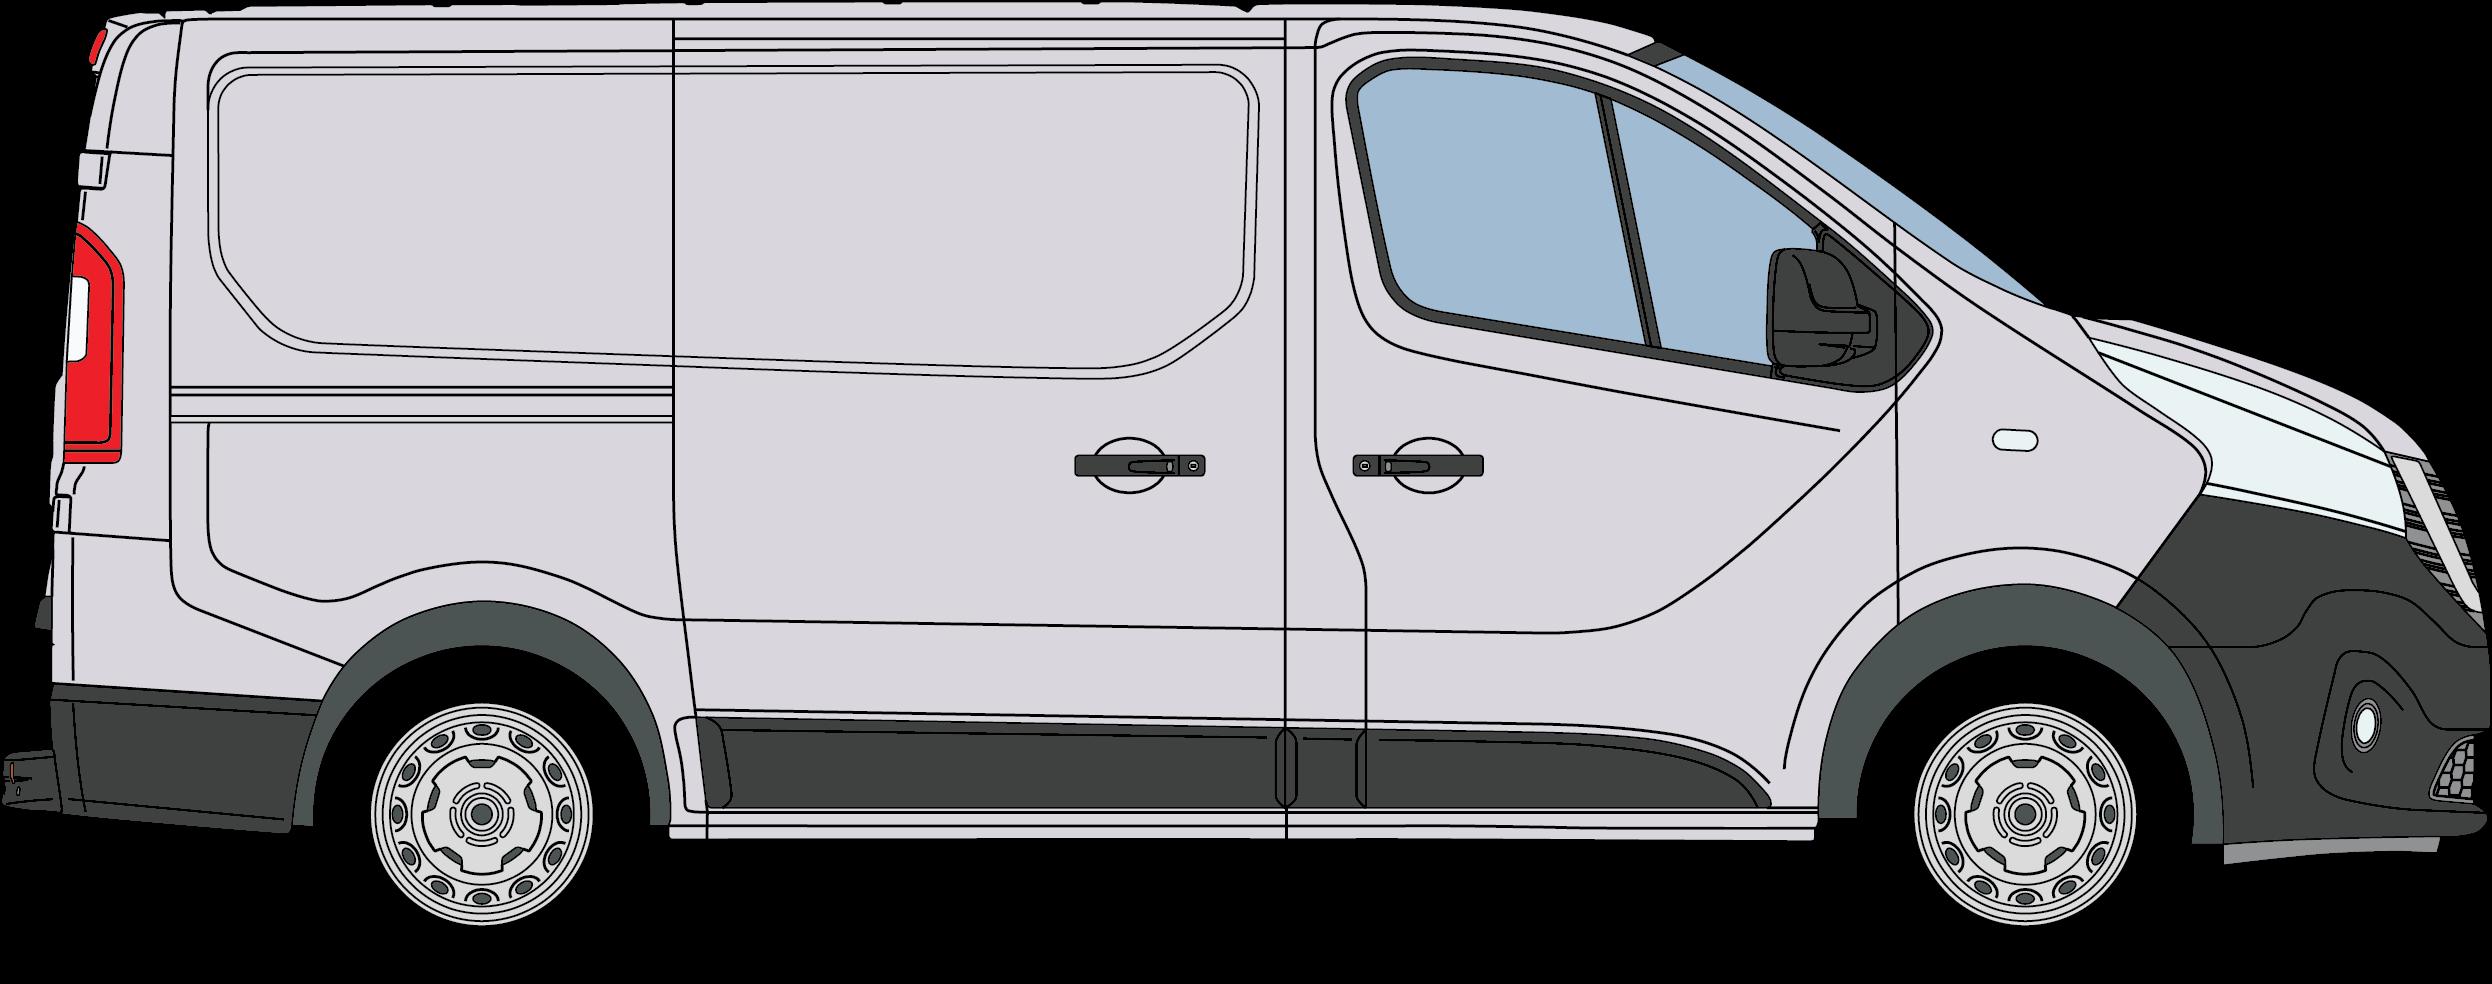 Nissan Nv300